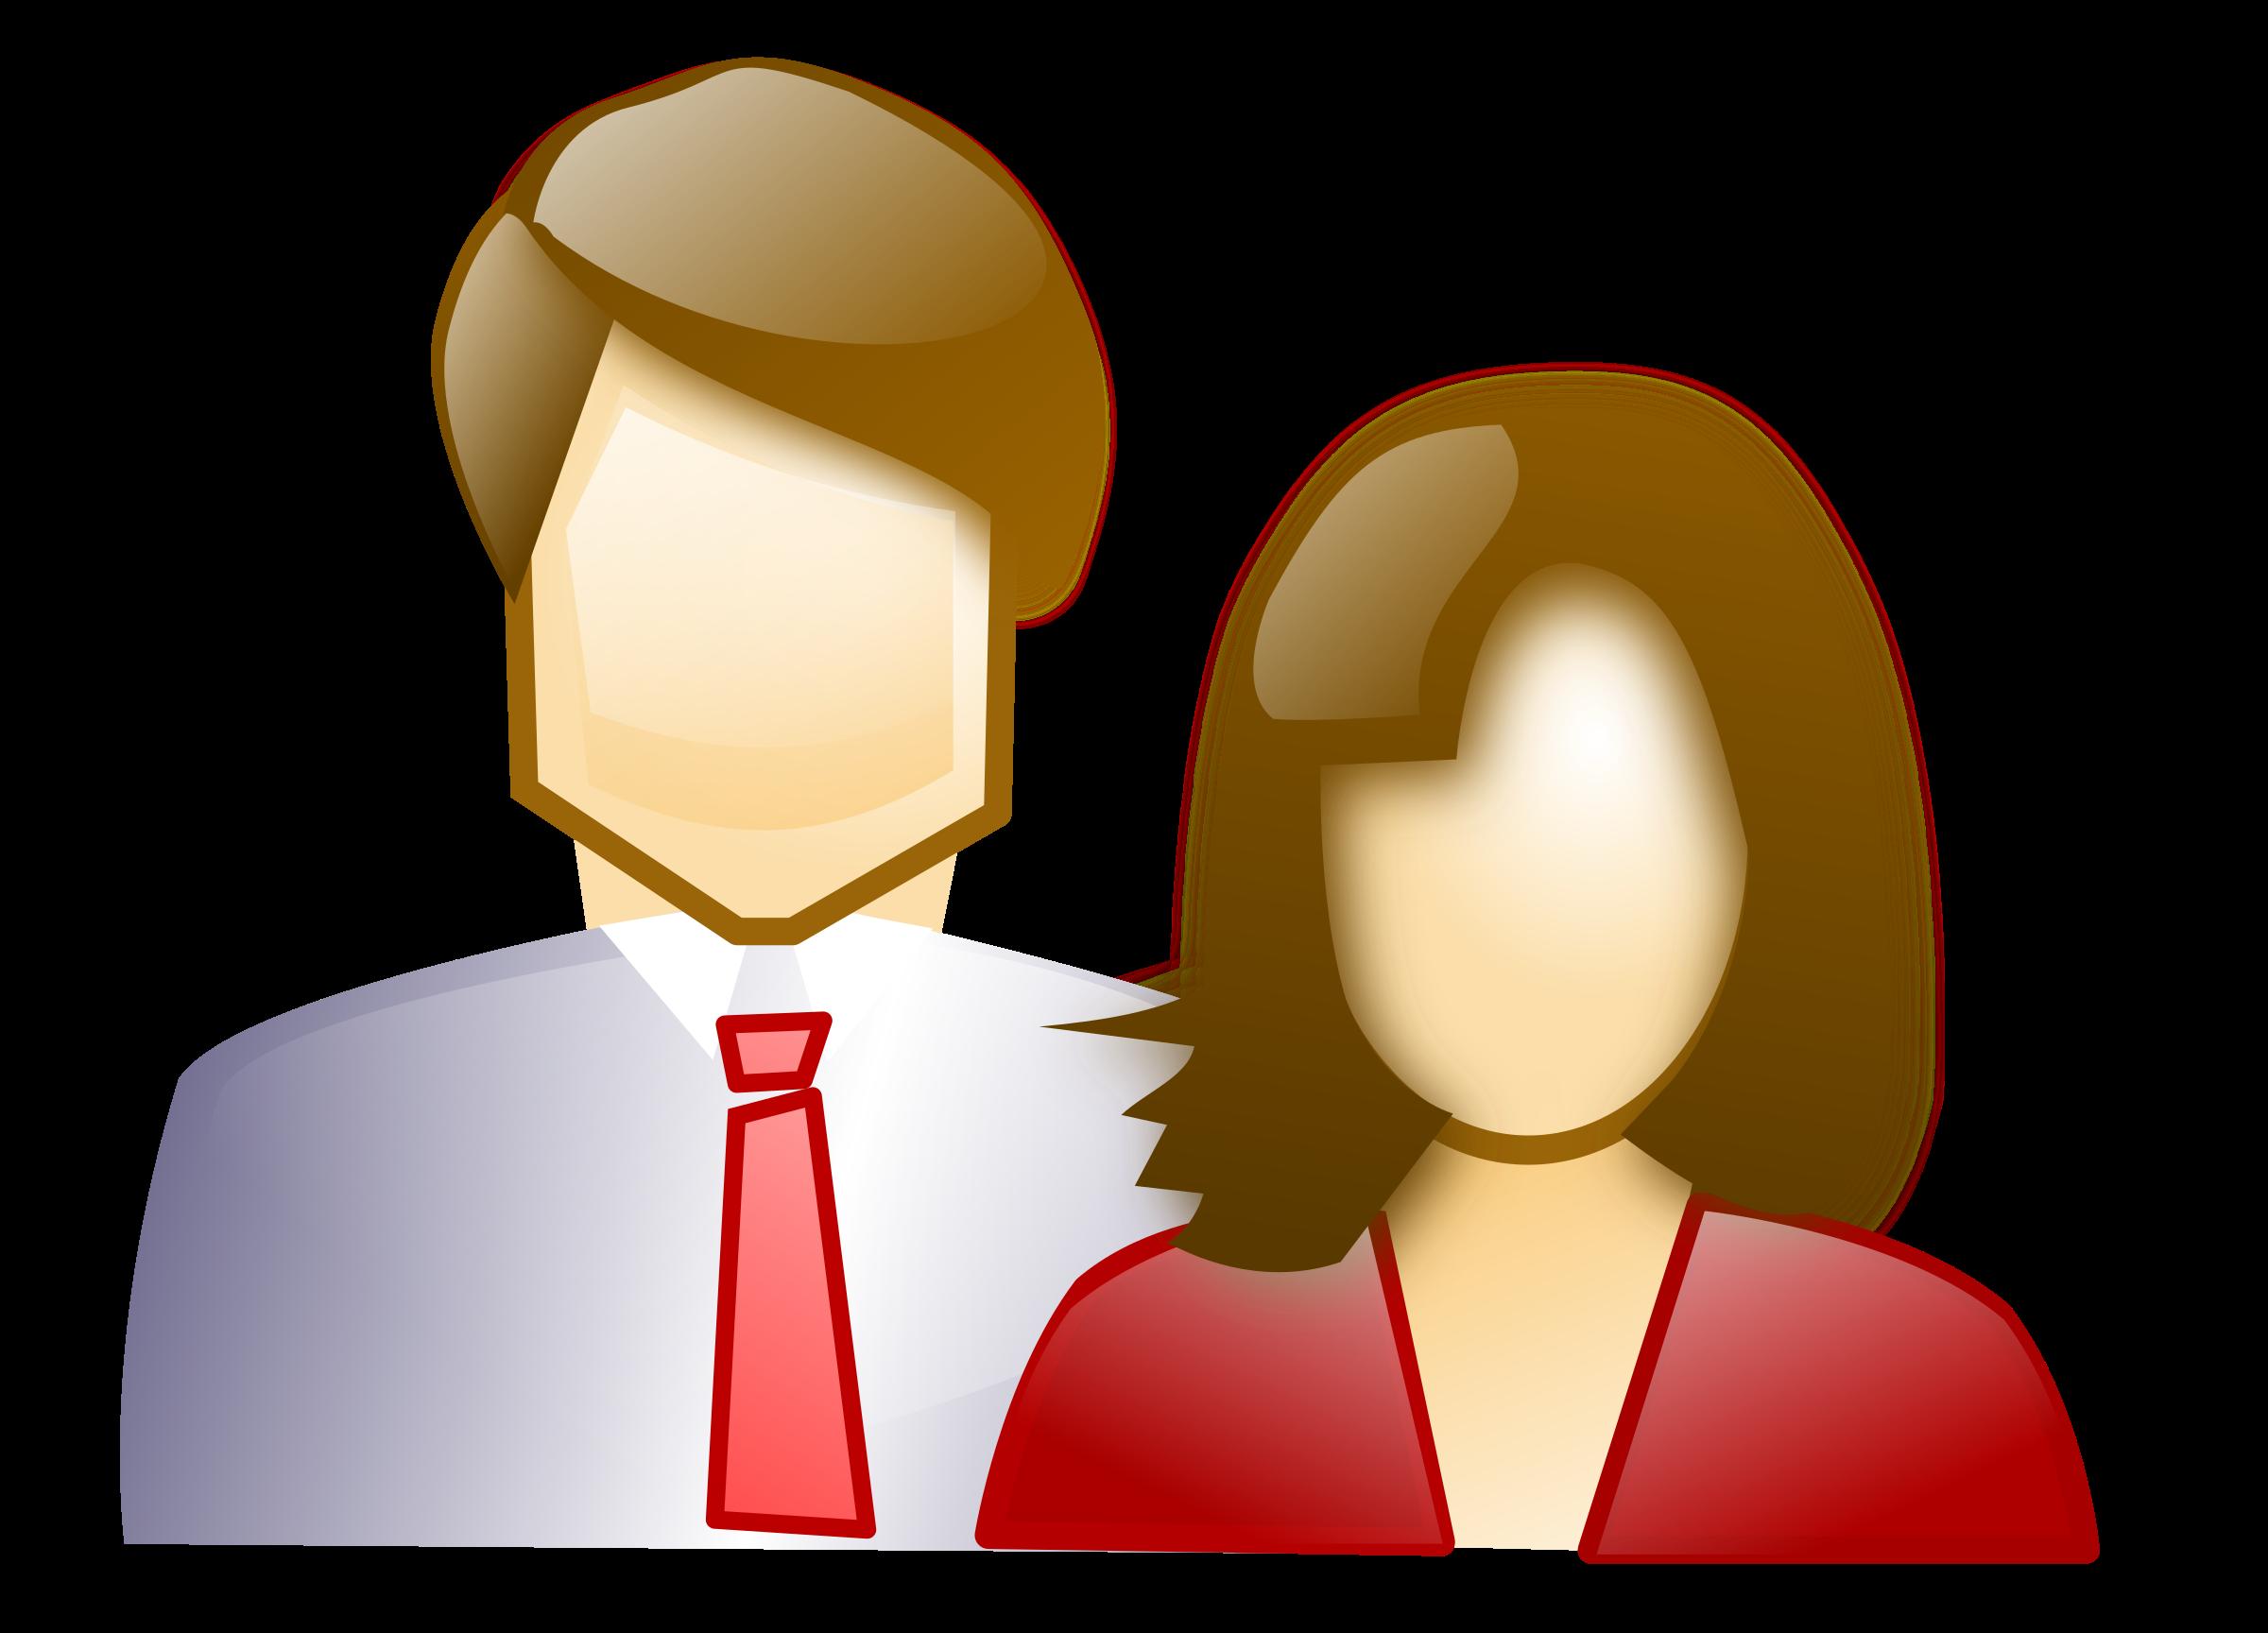 Big image png. Communication clipart couple